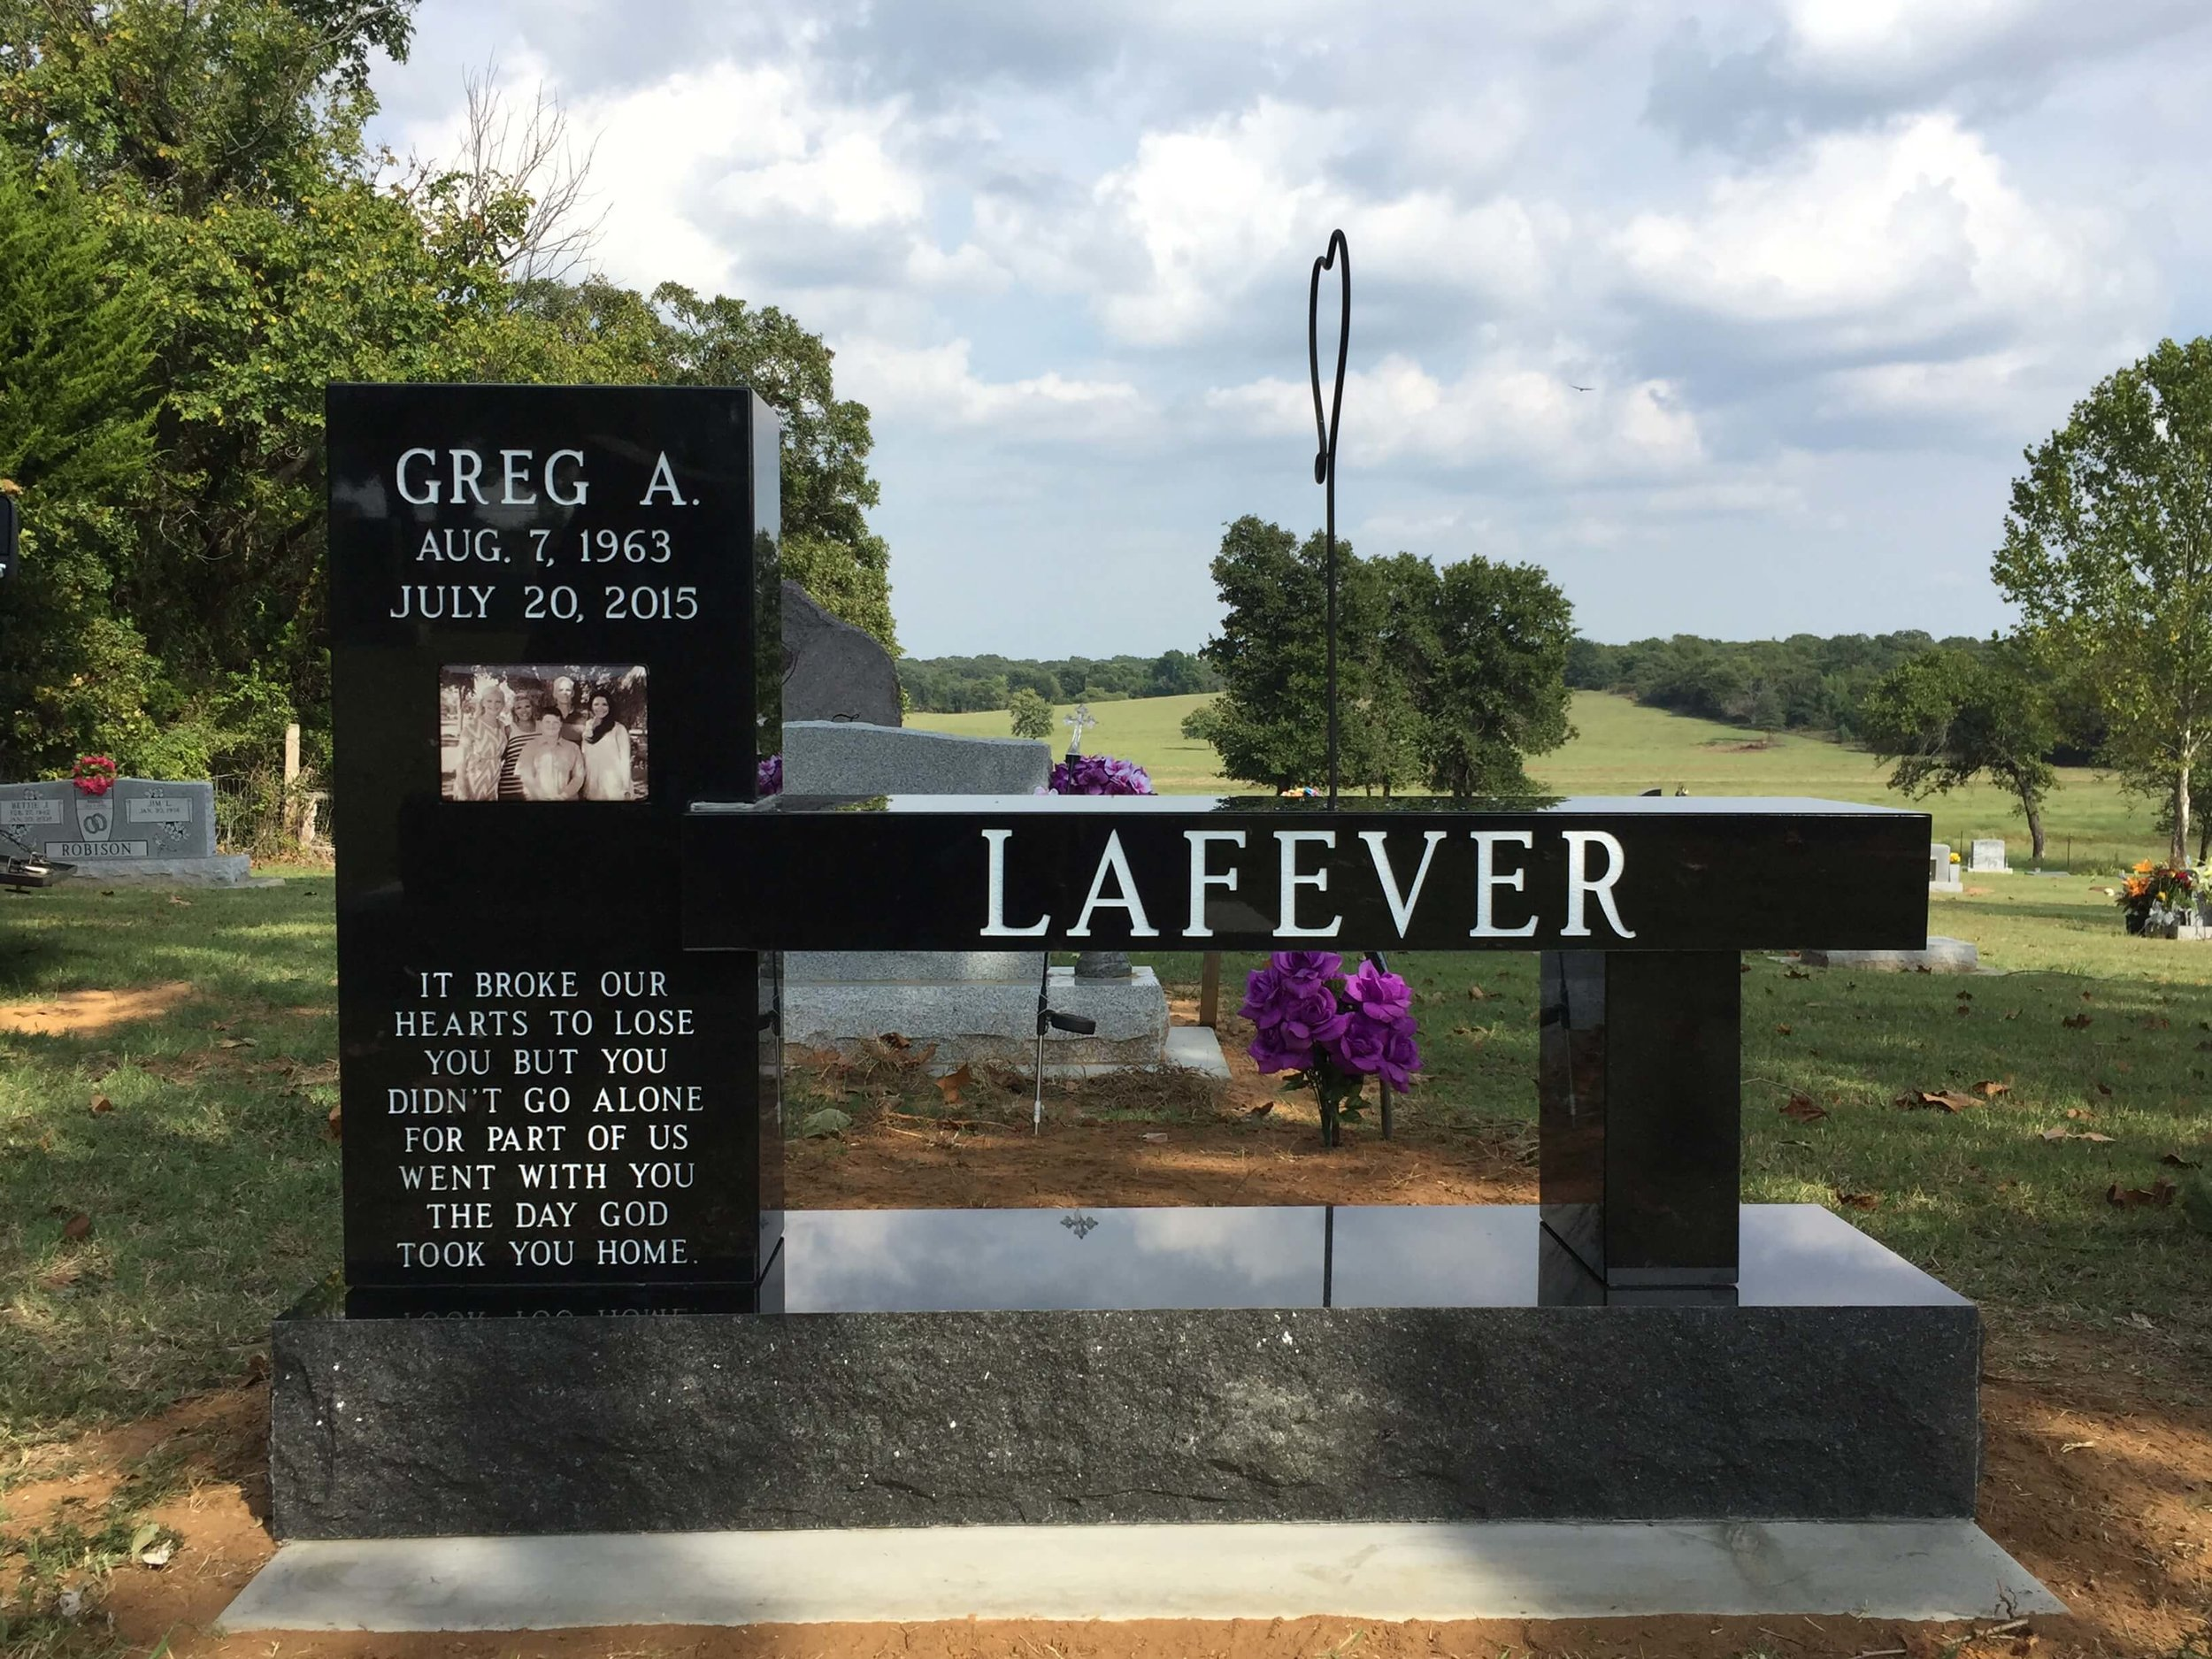 32. Elmwood Cemetery, Choctaw